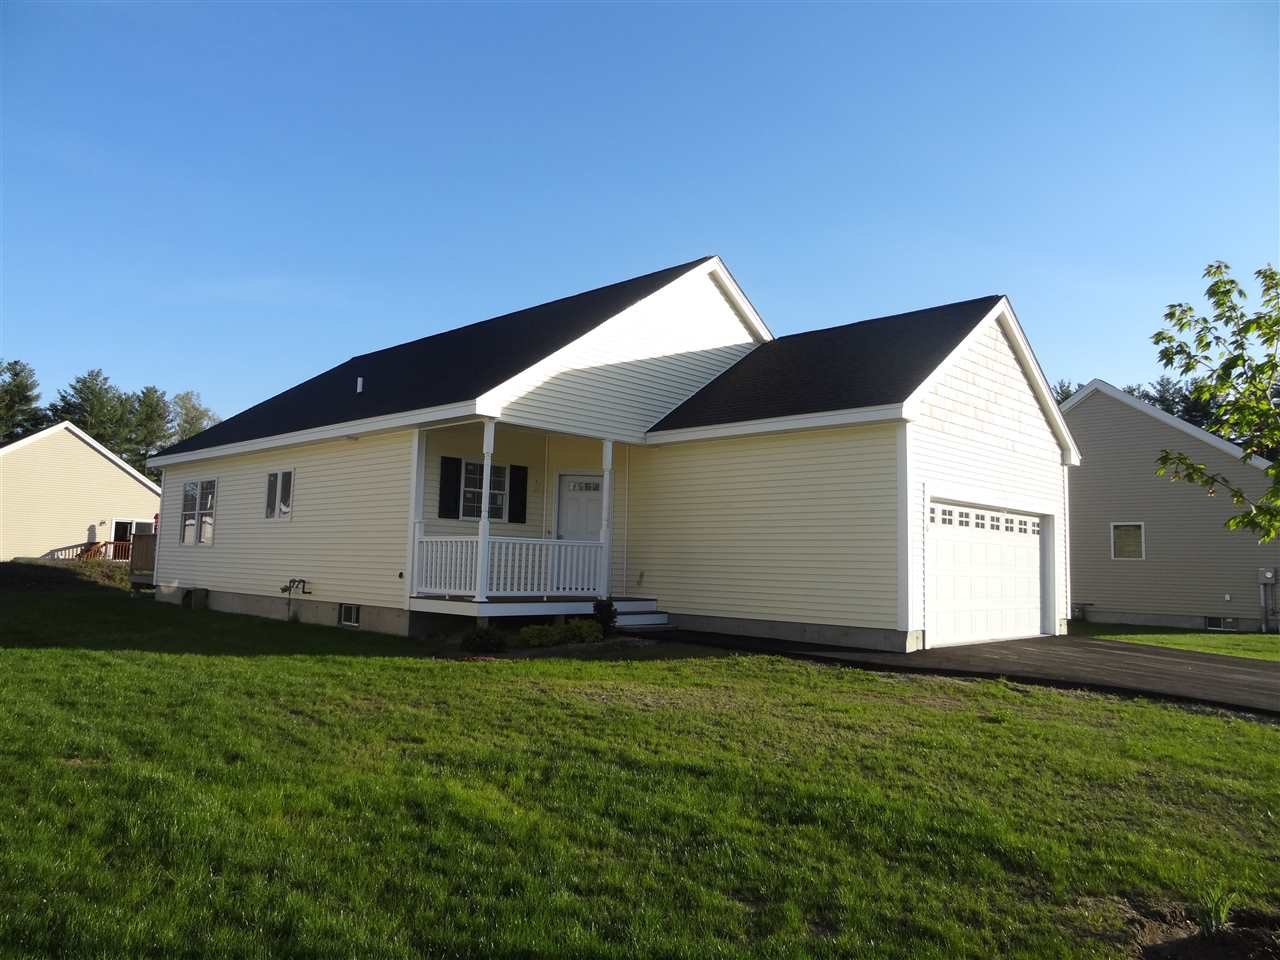 Real Estate for Sale, ListingId: 36885156, Concord,NH03303